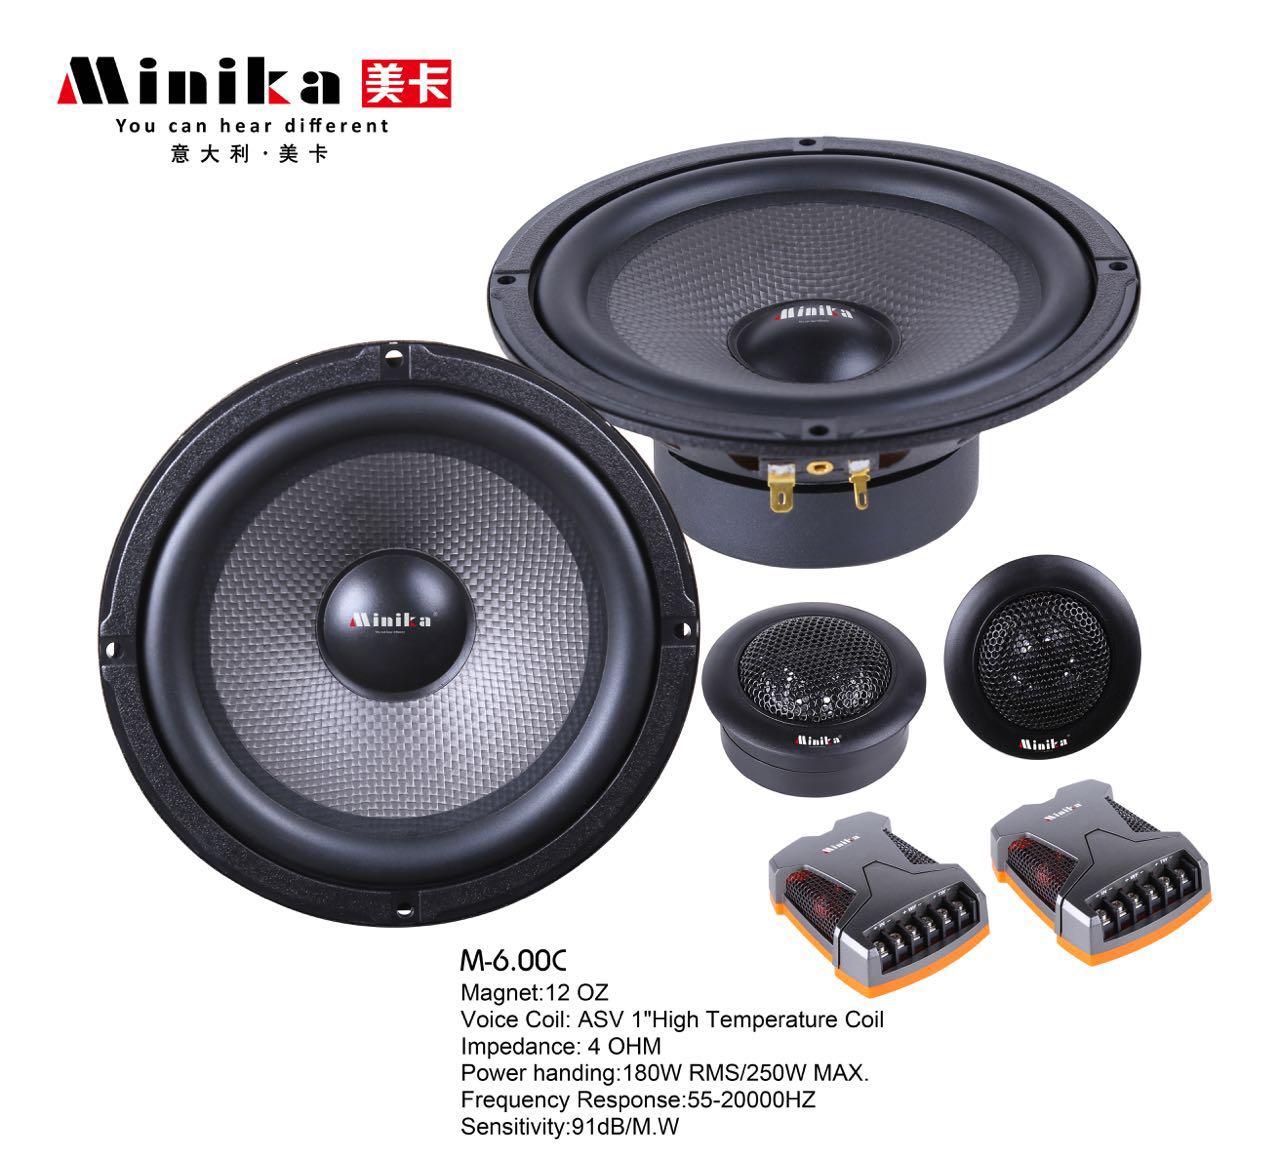 Minika 6.5'' Inch Car Audio Speakers Sets 250W with Tweeter HIFI Car Speaker Set Coaxial Speaker 12v Loudspeaker Altavoces Coche